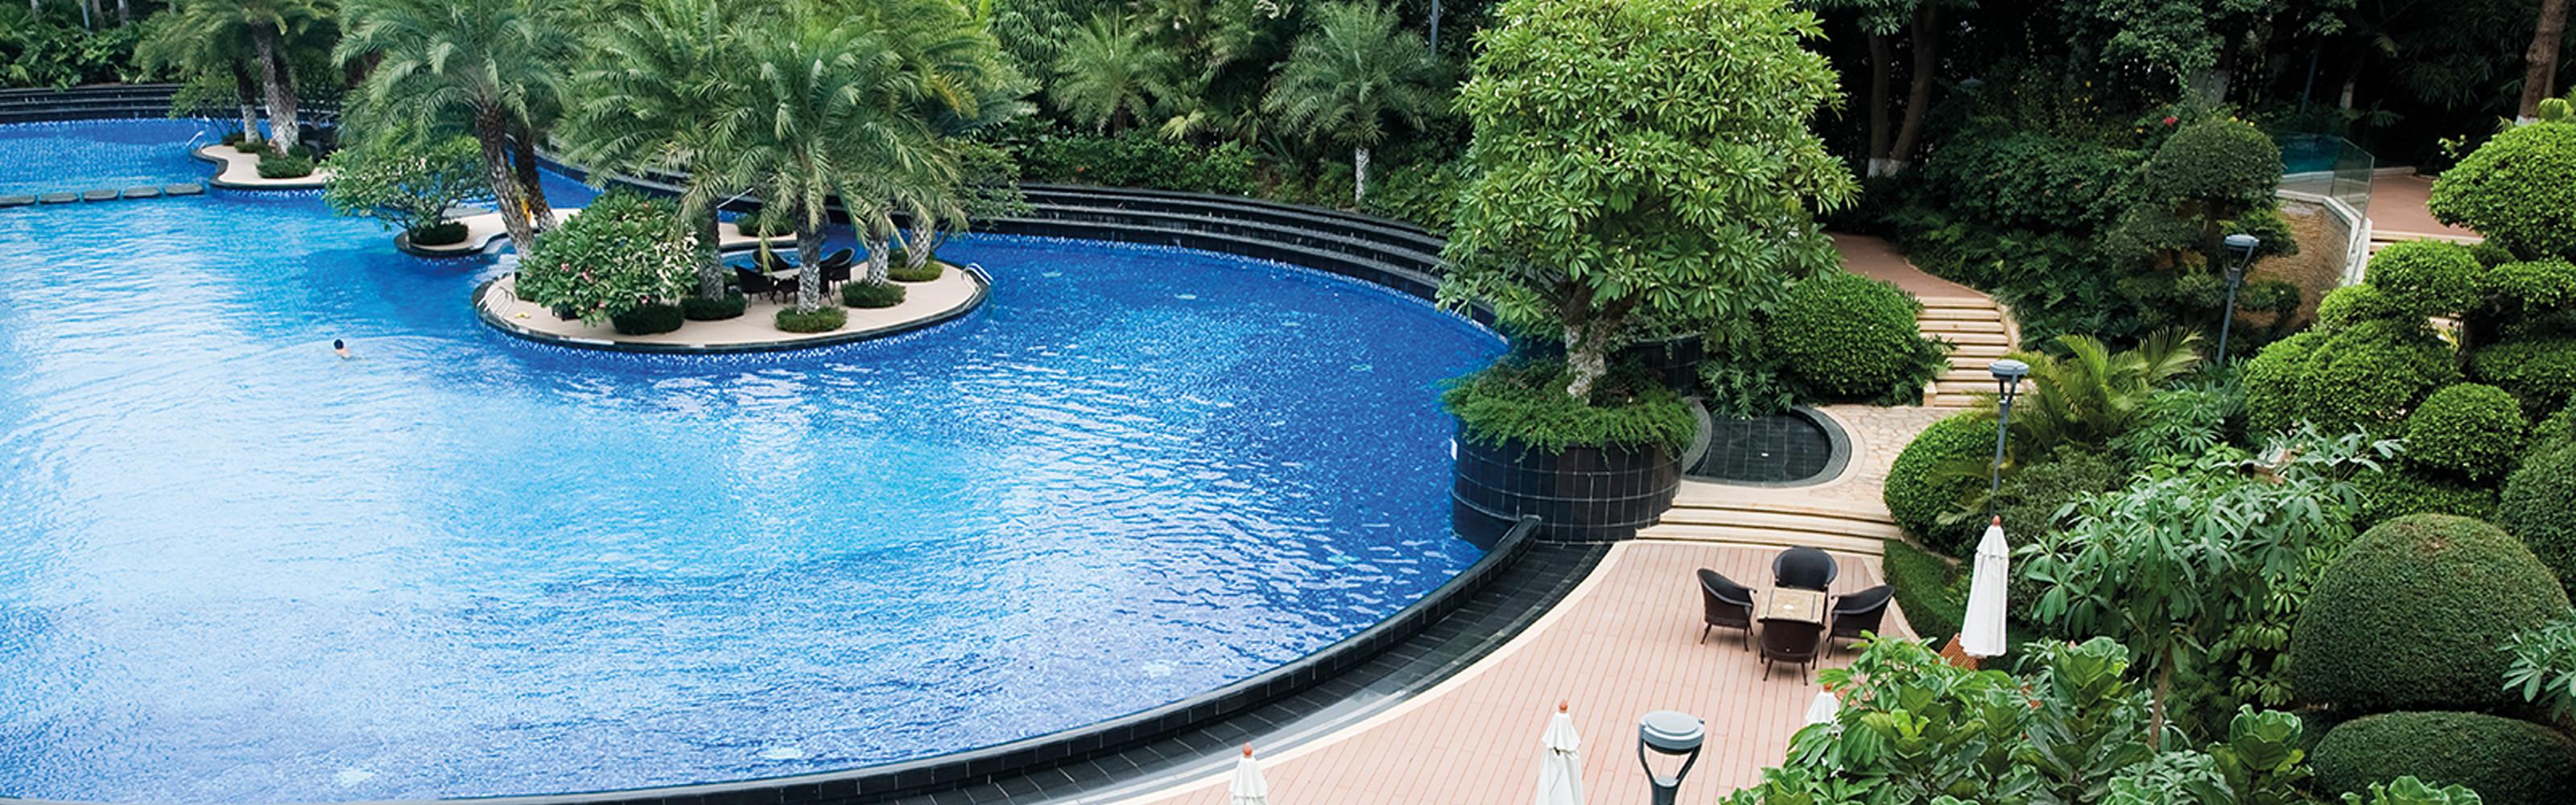 hotel-garden-&-pool-shutterstock_91946972.jpg